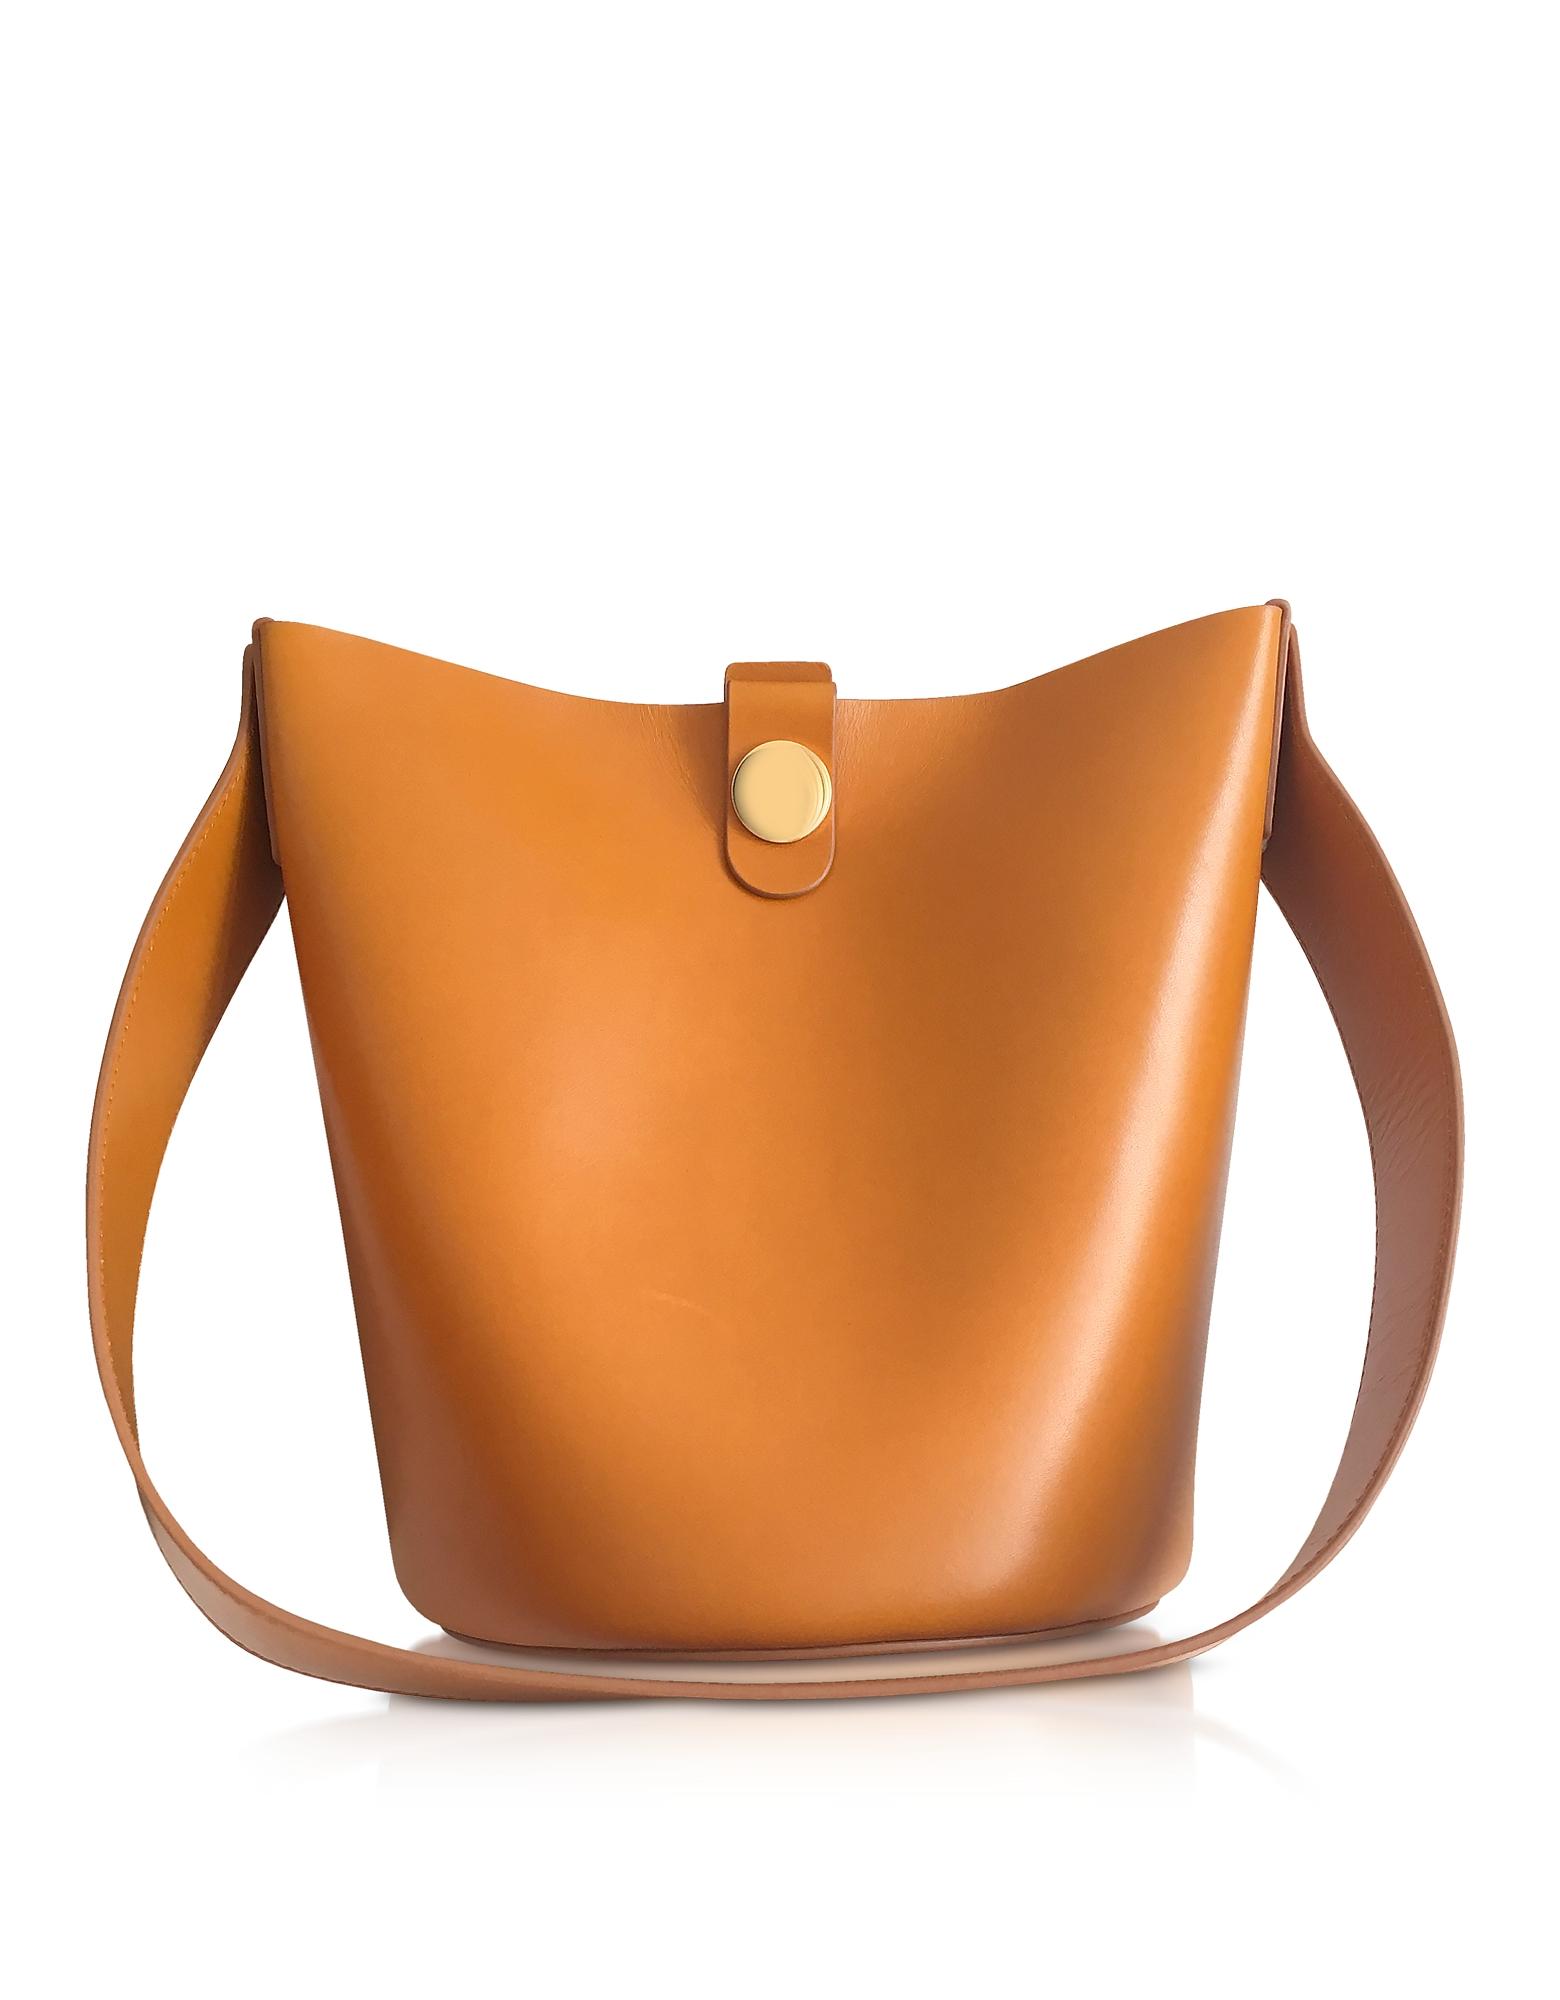 SOPHIE HULME | Sophie Hulme Designer Handbags, Shiny Saddle Leather The Swing Bag | Goxip